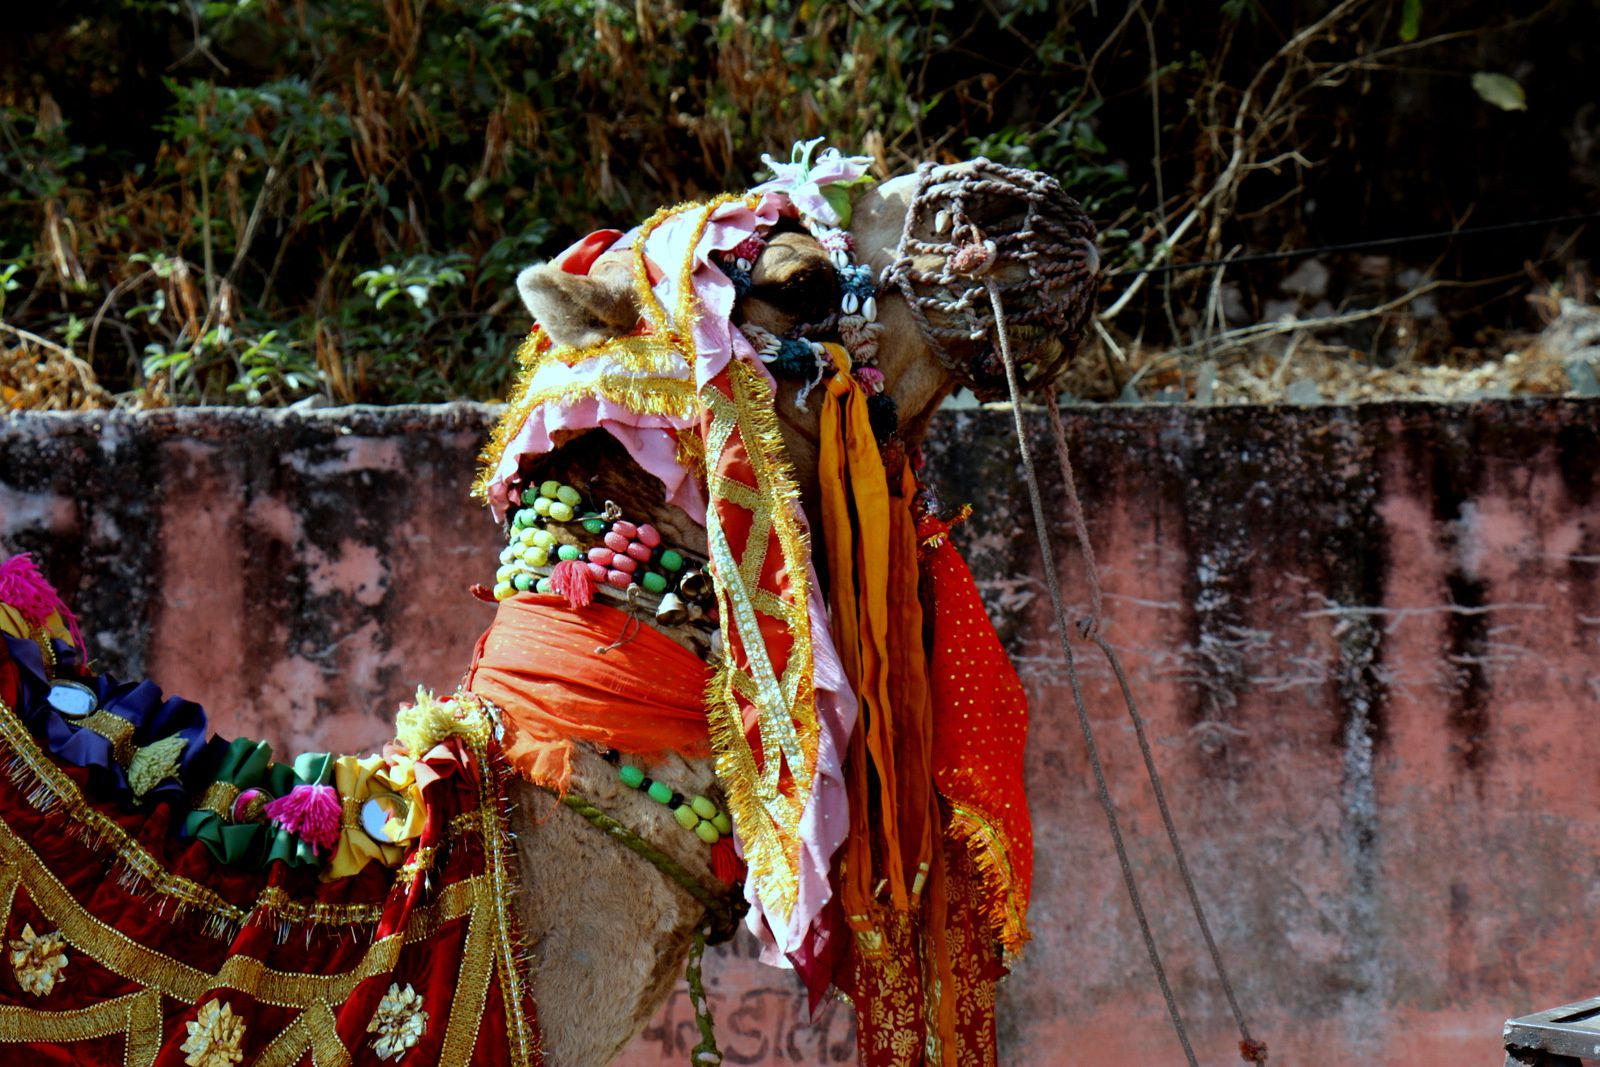 Monsoon palace sajjan Garh,  Arsi Vilas et Mohan Mandir, lac Pichola (Rajasthan, Inde)